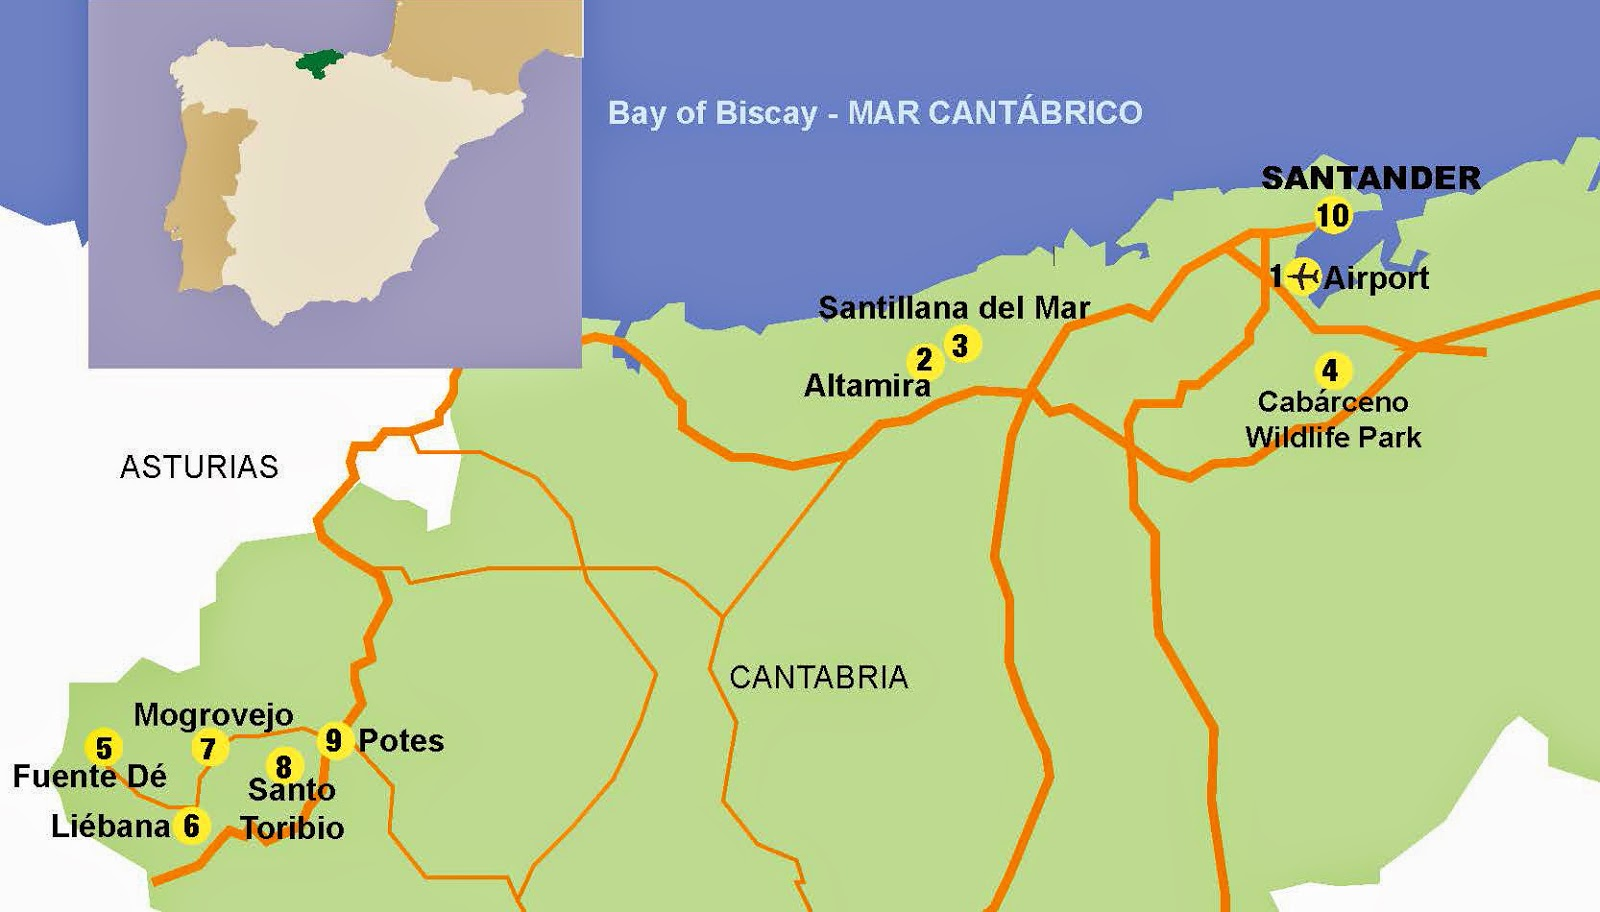 CANTABRIA an alternative Spain HOLIDAYezine